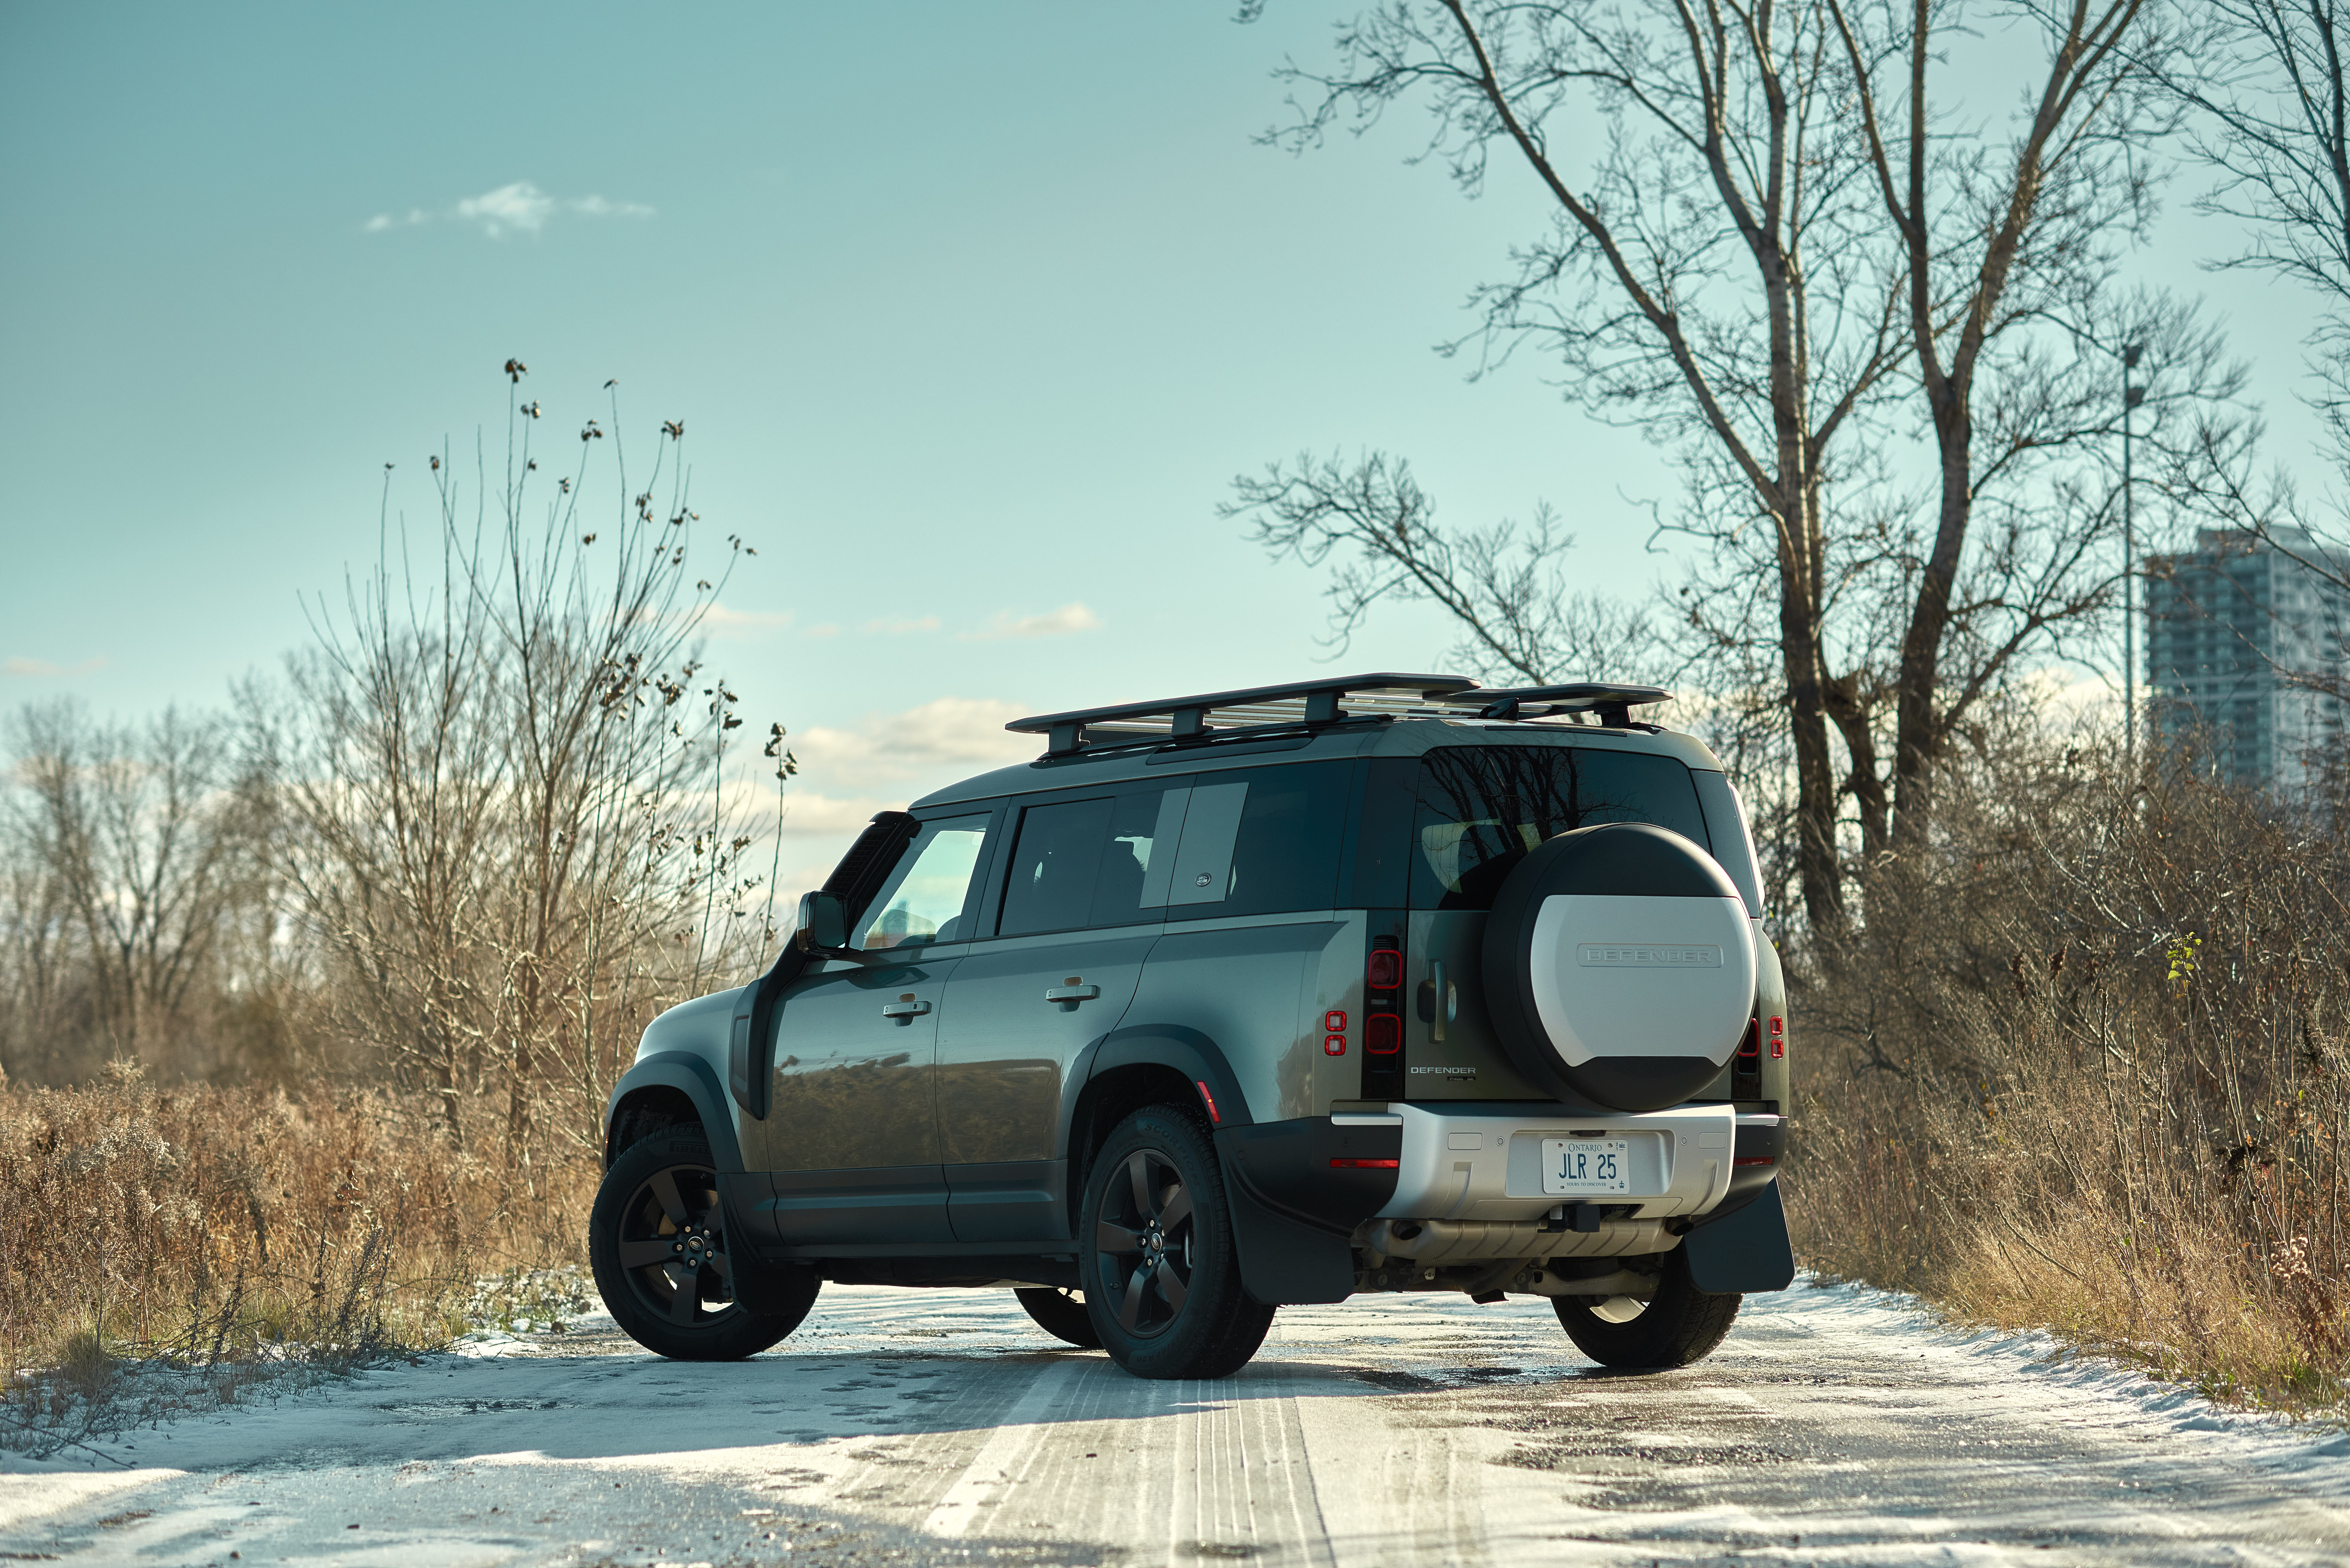 2021 Land Rover Defender Rear Three Quarter | Clavey's Corner